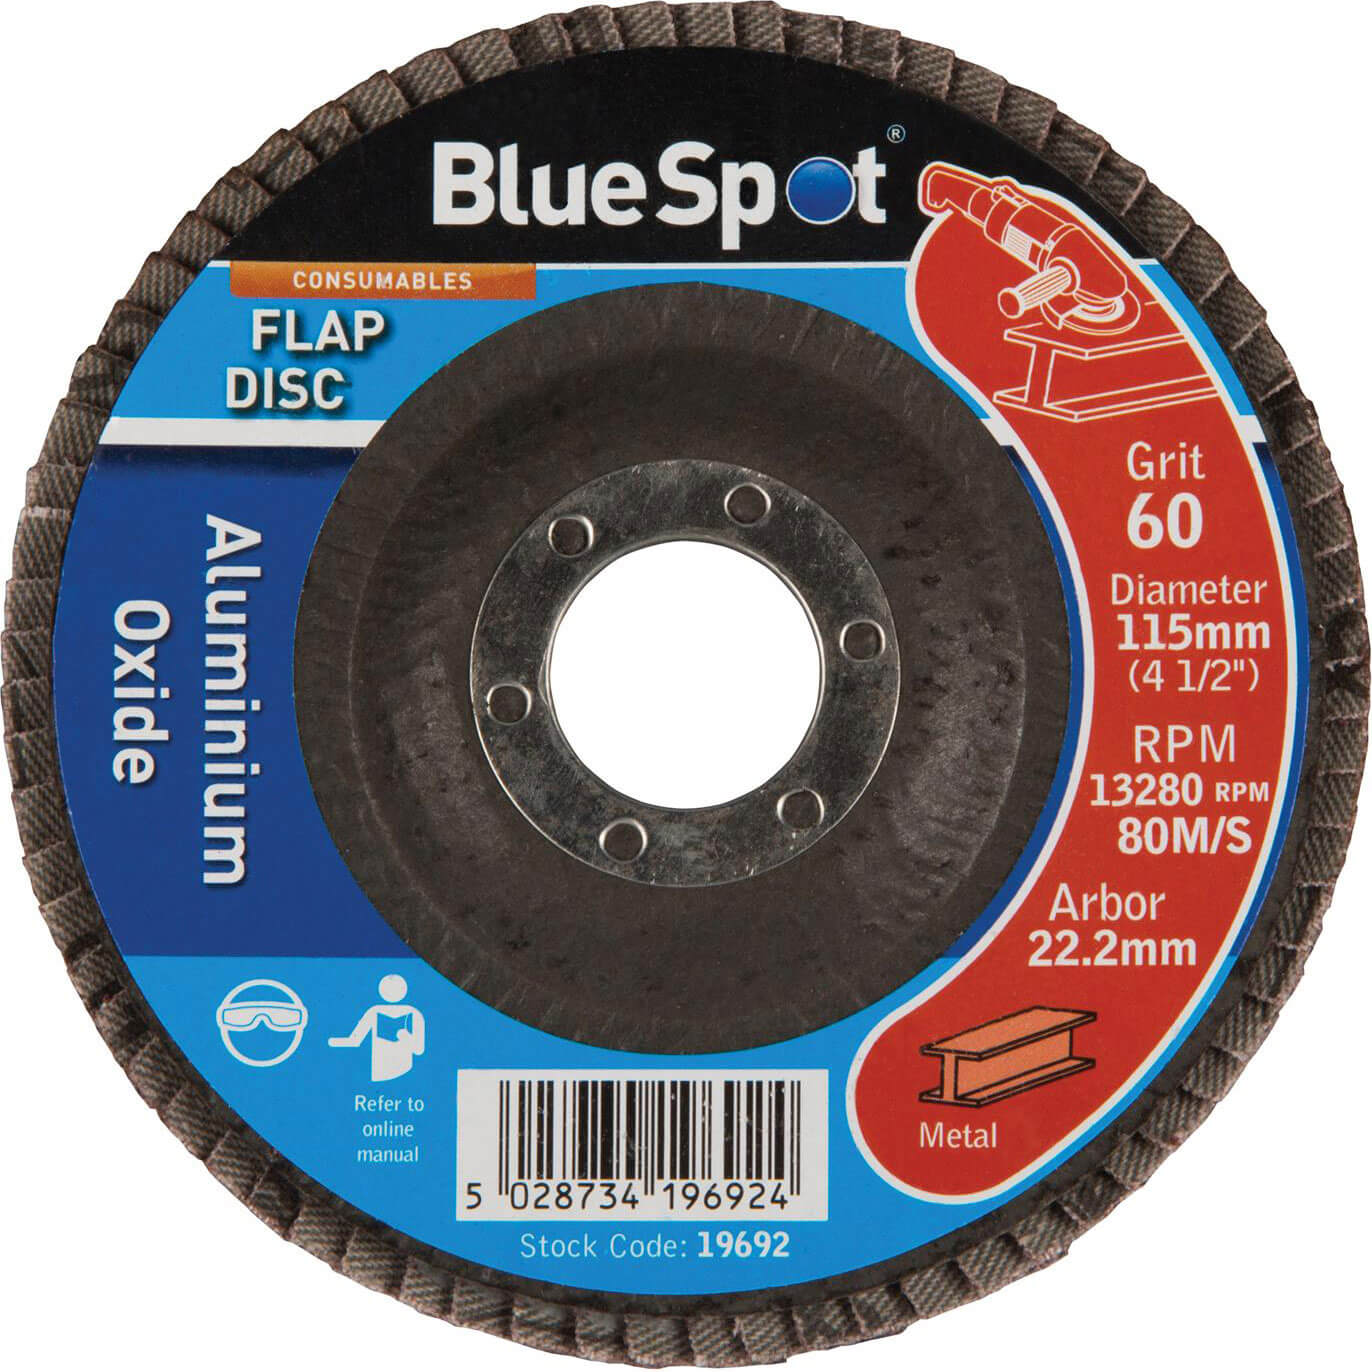 Image of BlueSpot Flap Disc 115mm 115mm 60g